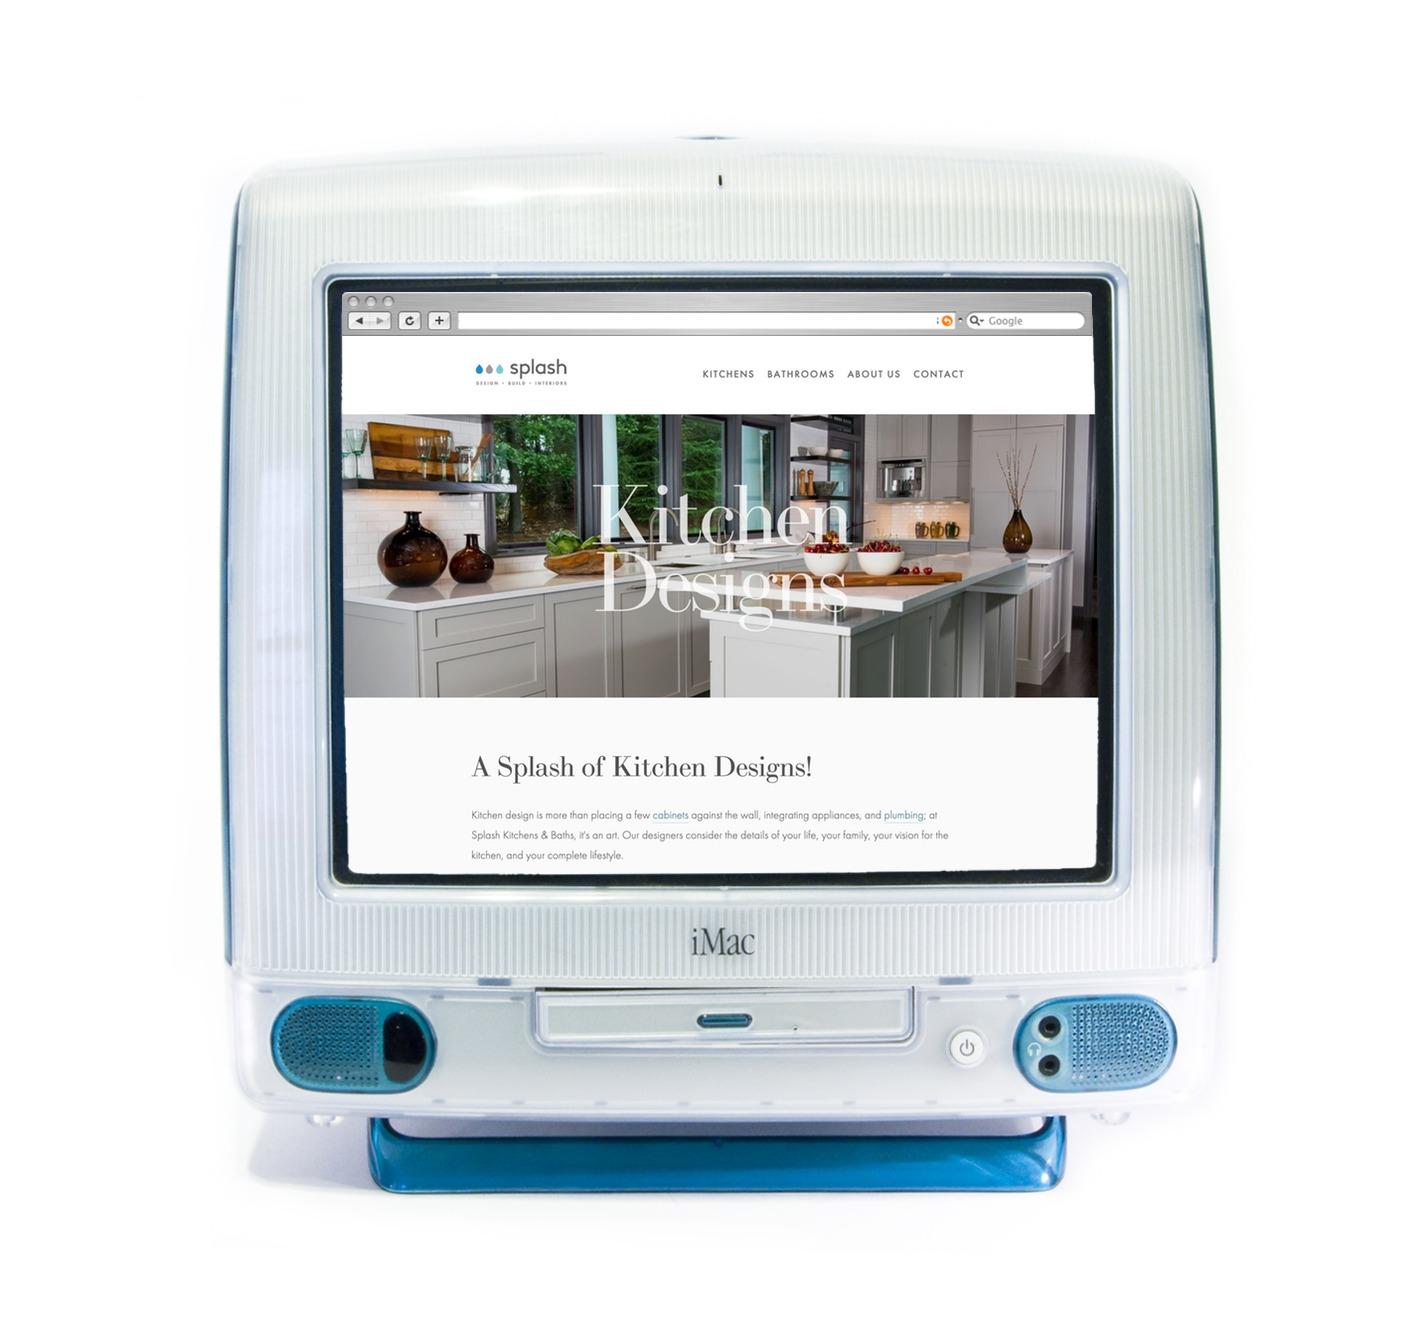 website-iMac-splash.jpg